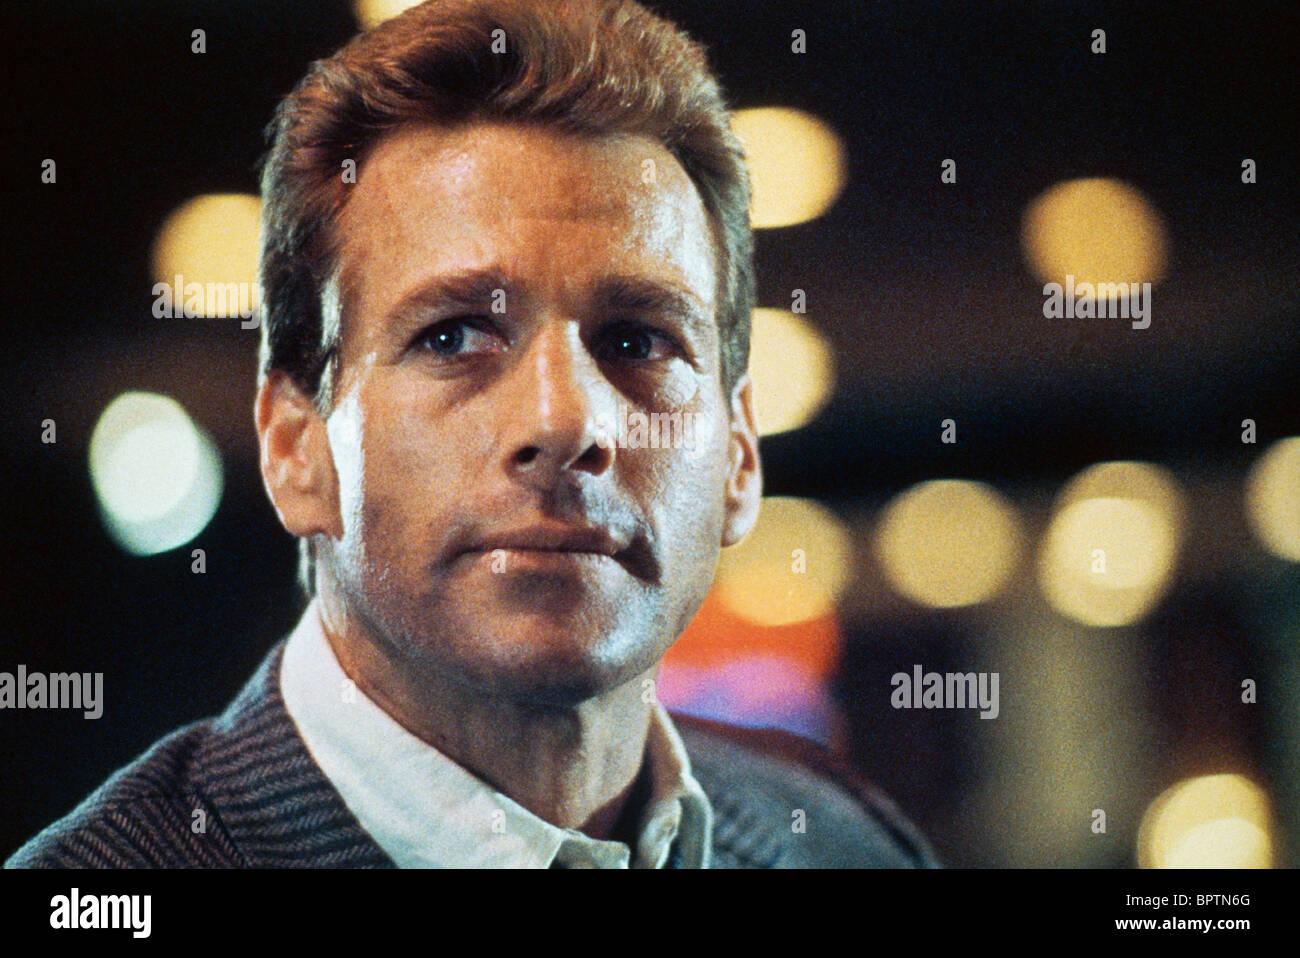 RYAN O'NEAL ACTOR (1974) - Stock Image